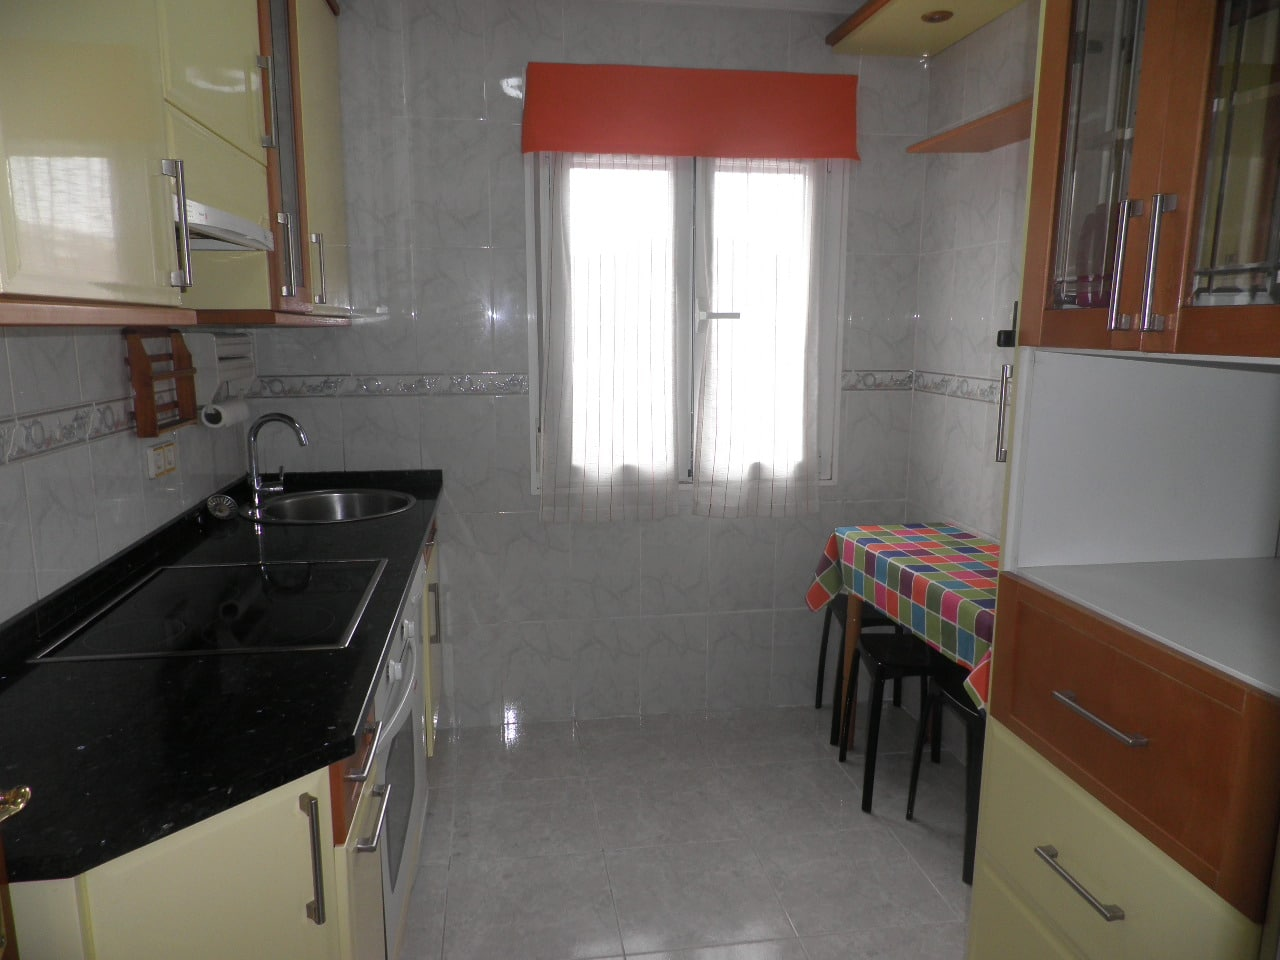 V04725-01-COCINA-PISO-ARANA-TRIVINSA-INMOBILIARIA